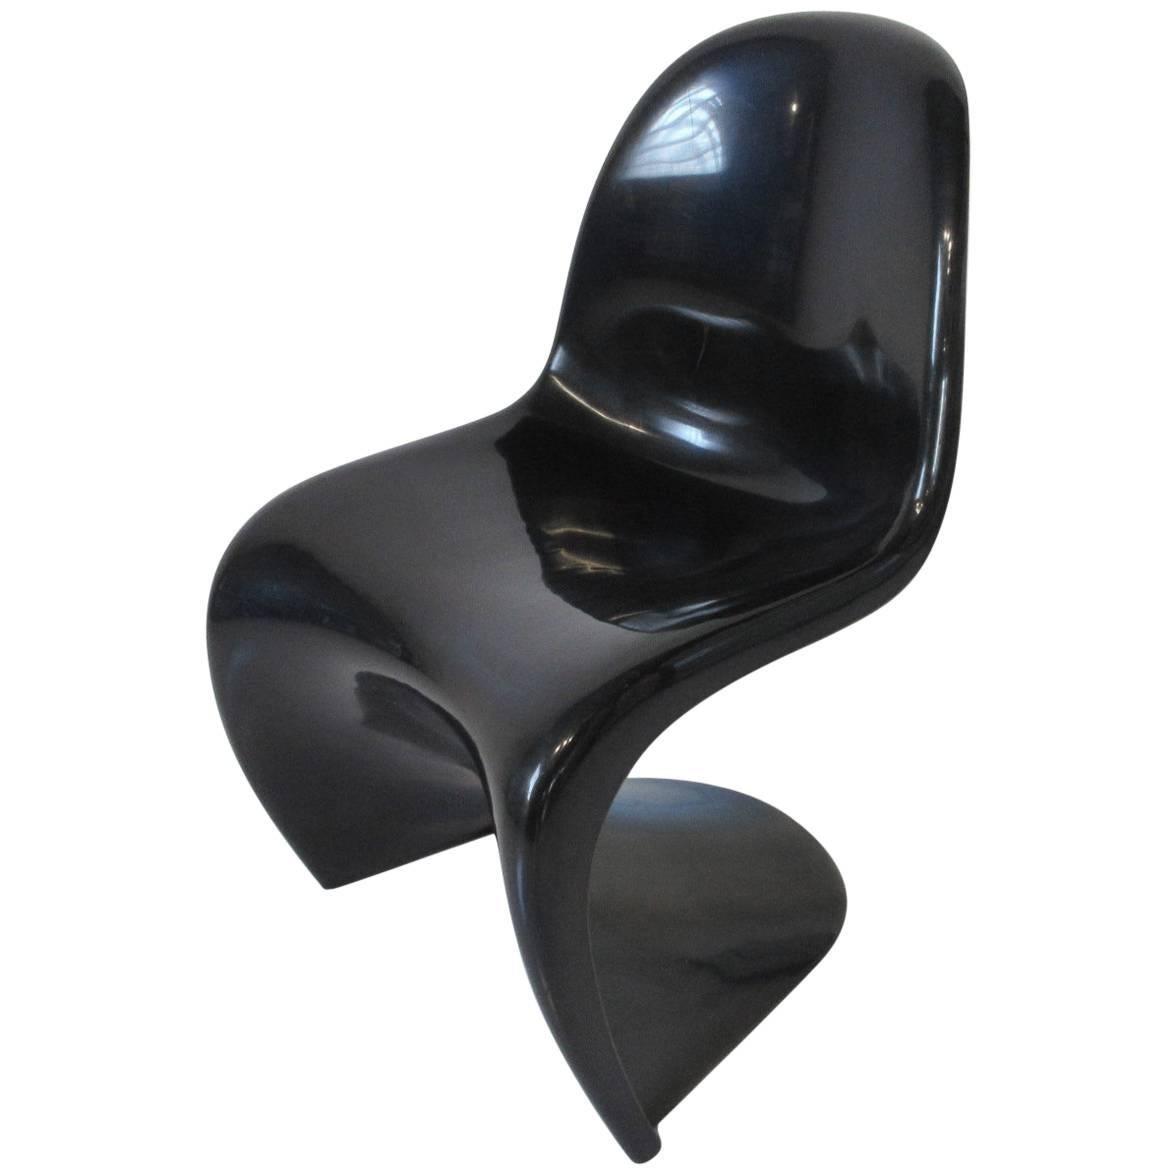 Verner Panton  S  Molded Plastic Chair ...  sc 1 st  1stDibs & Verner Panton